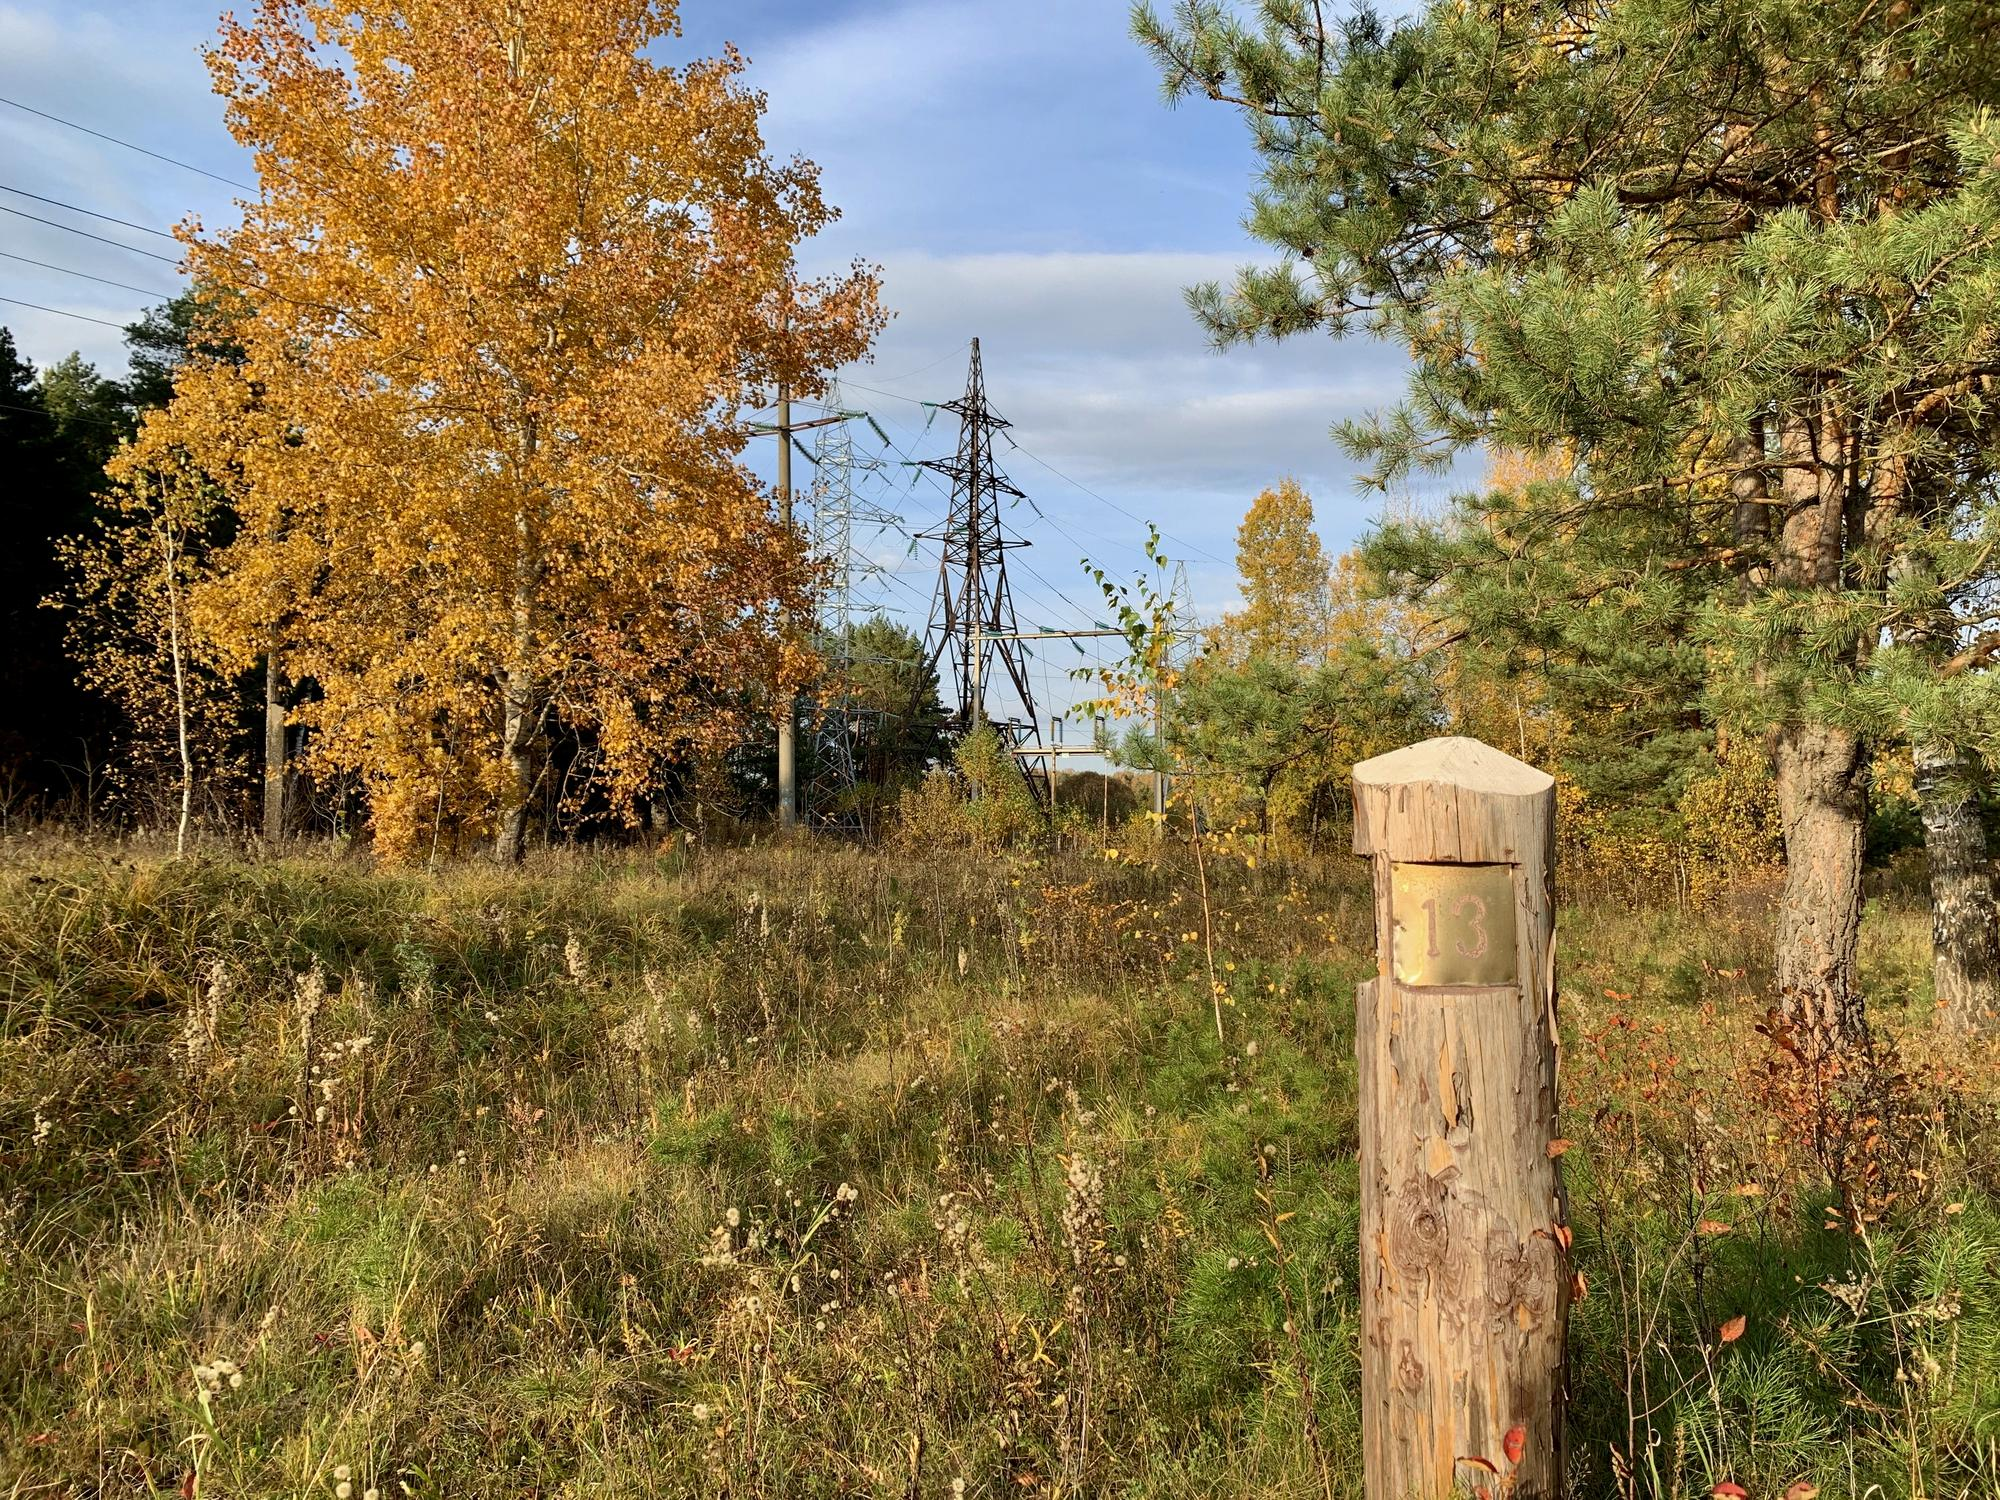 🇷🇺 Калуга, Россия, октябрь 2019.